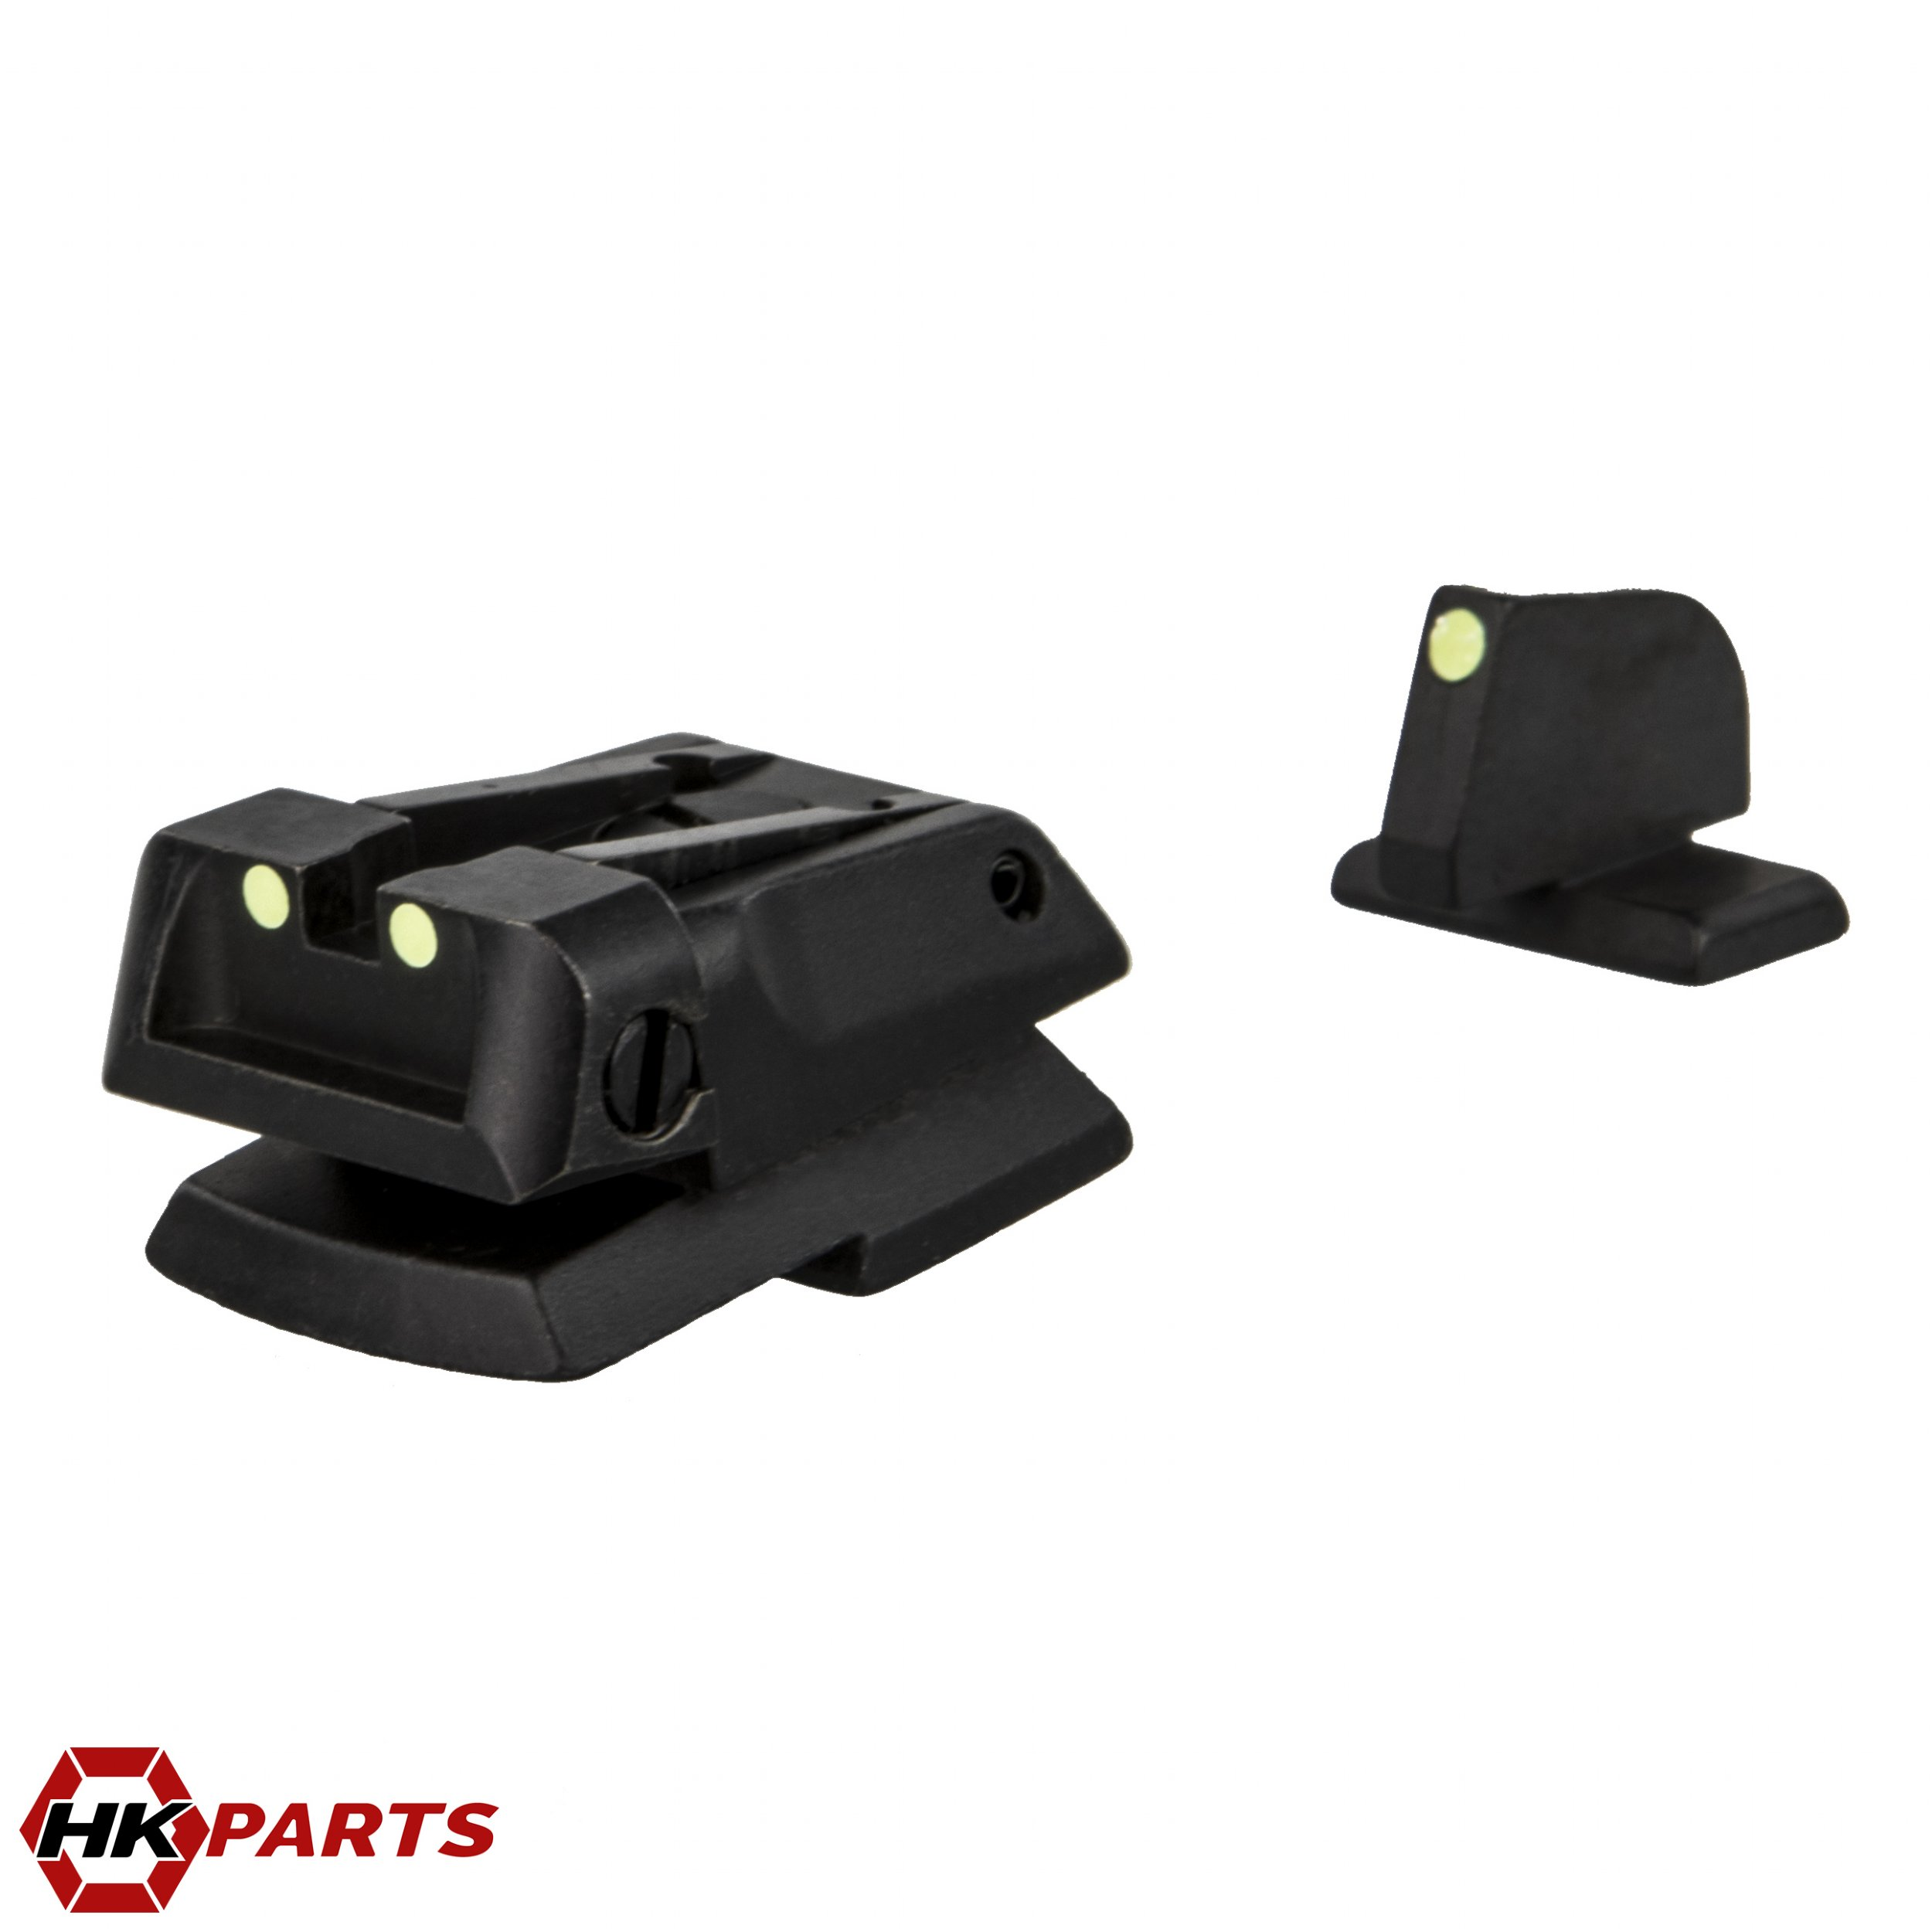 USP Tactical sights on USP Compact?-suppressor-sights-superluminova-vp9-p30-hk45-6.jpg